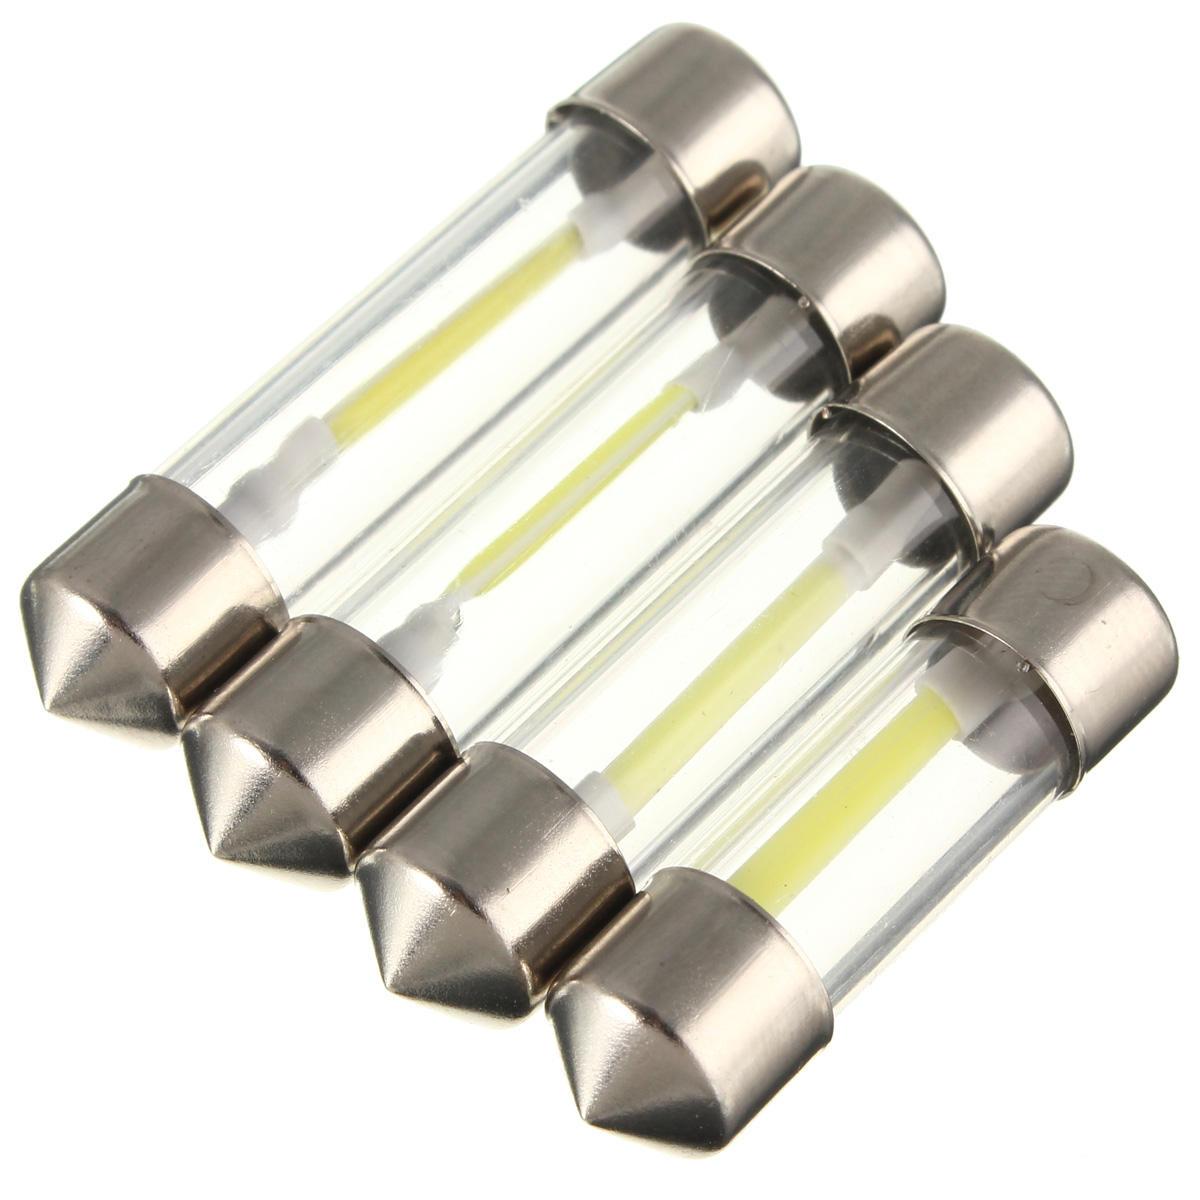 31/36/39/41mm MAZORCA LED Adorno Dome Luces Licencia Placa Mapa de lectura Lámpara